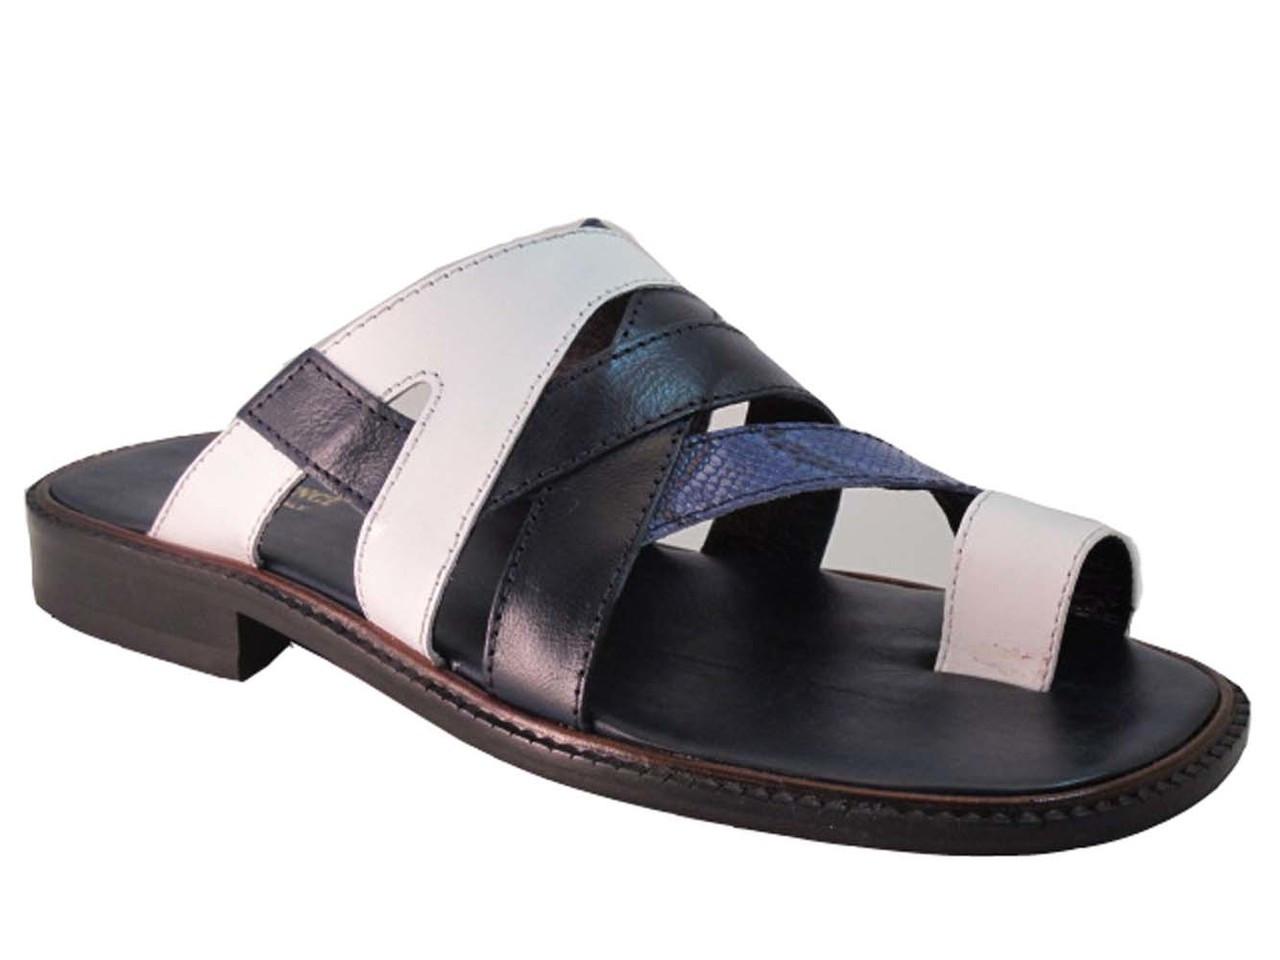 b3c13dd0edd81 Davinci 3839 Men's Push In Toe Italian leather Sandals, White/Blue